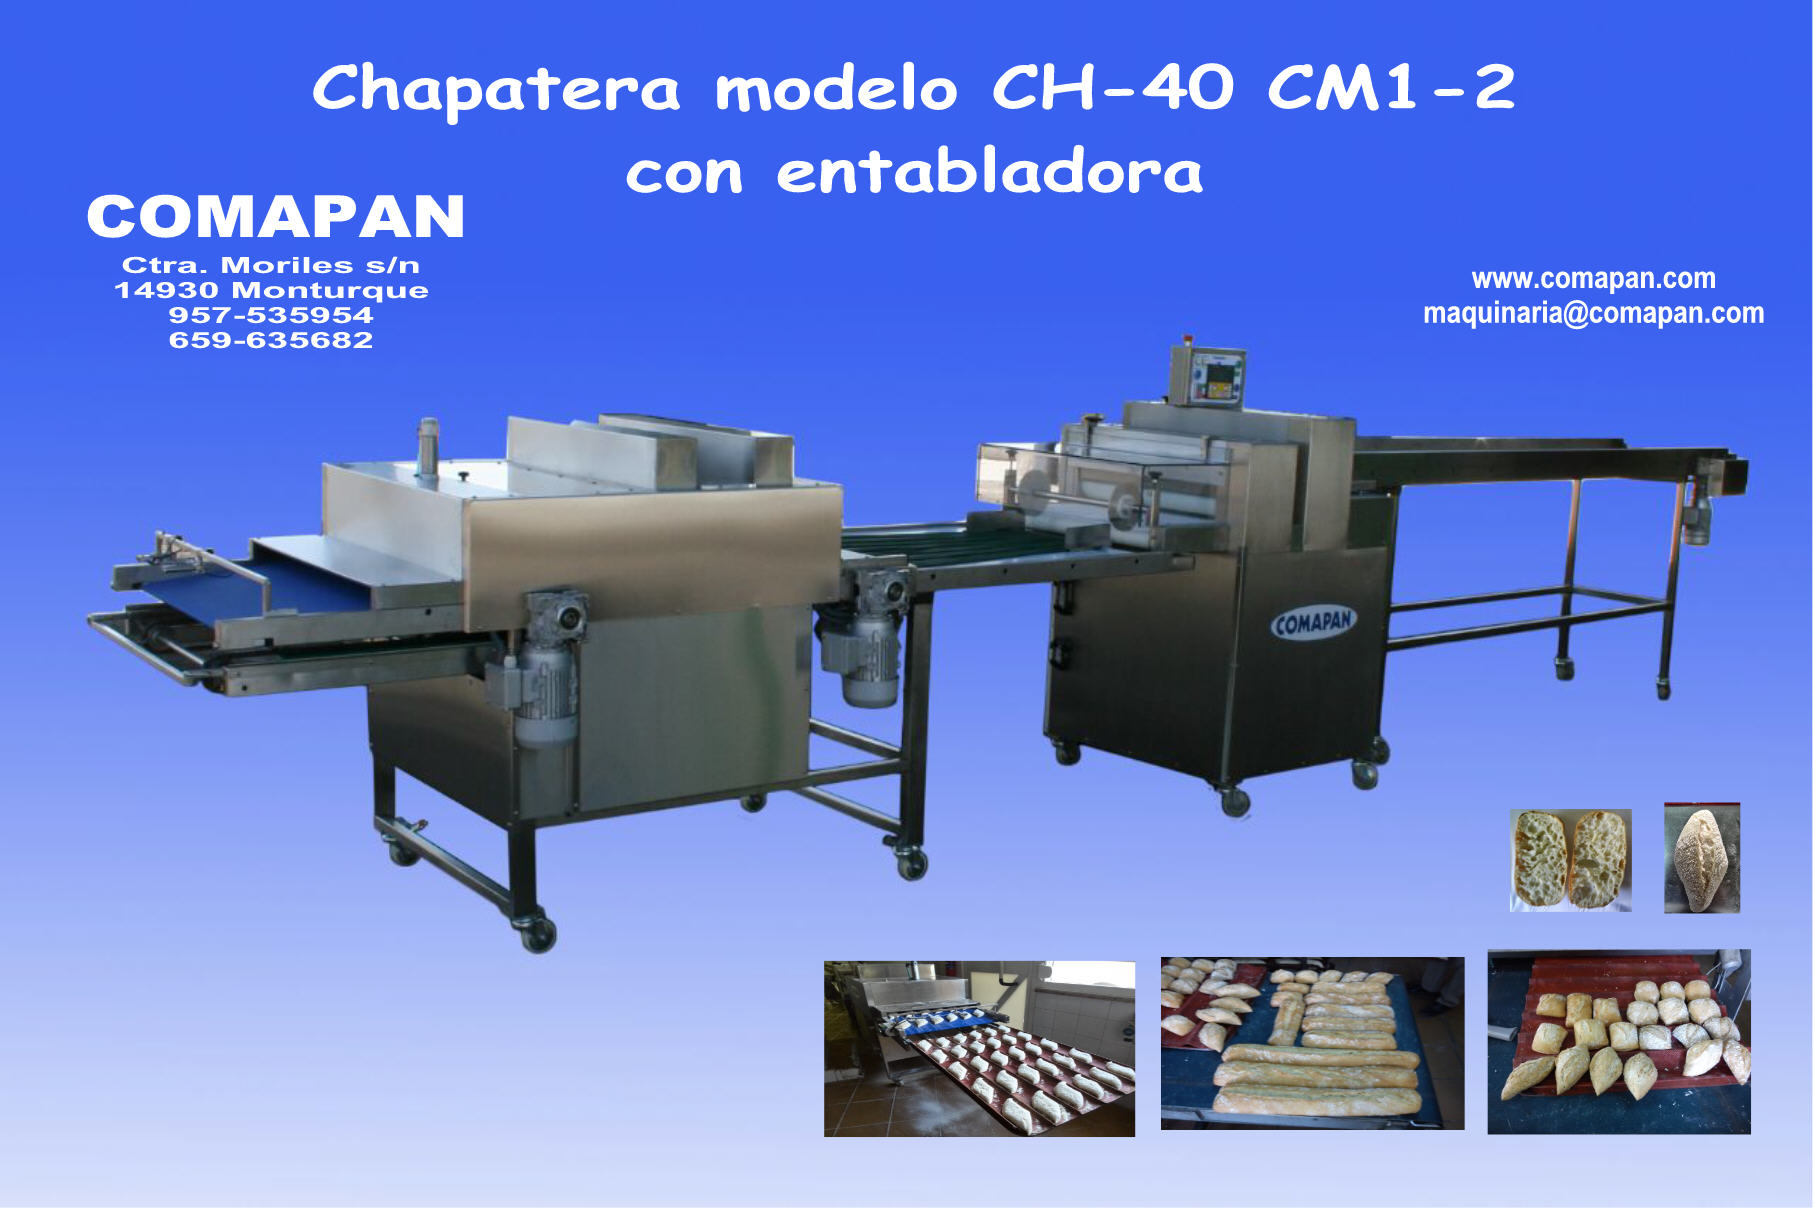 Cat. CH-40 CM1-2